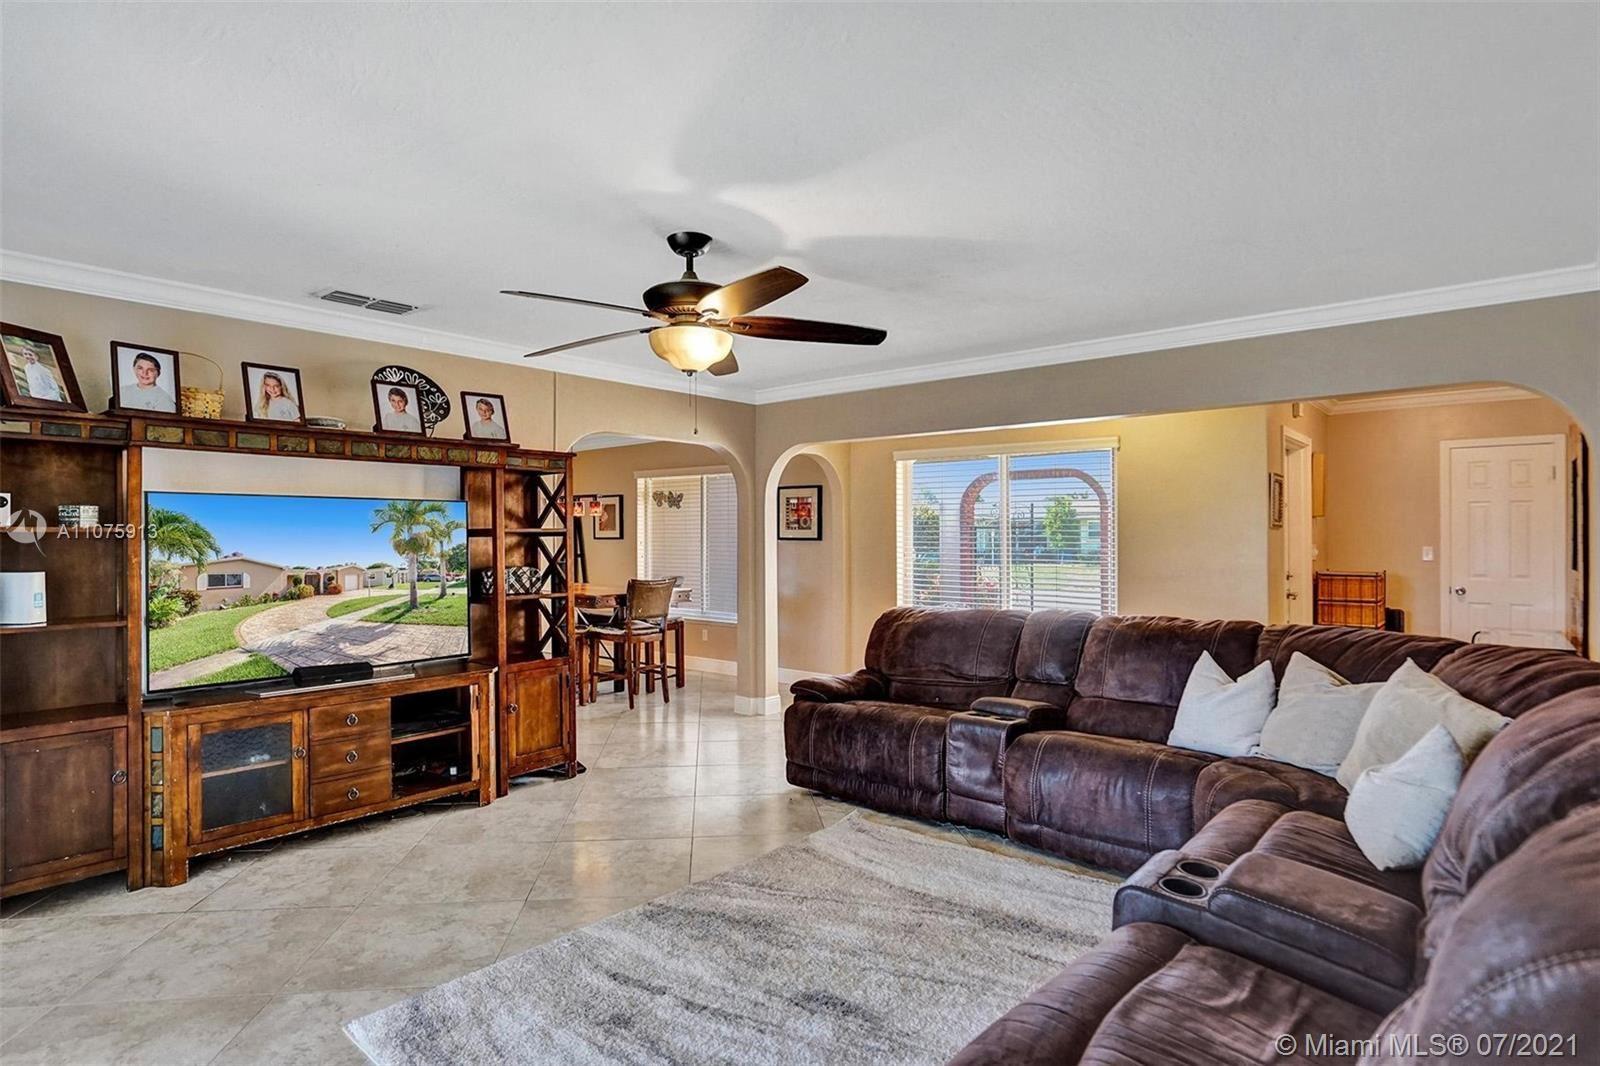 Photo of 8450 NW 19th St, Pembroke Pines, FL 33024 (MLS # A11075913)